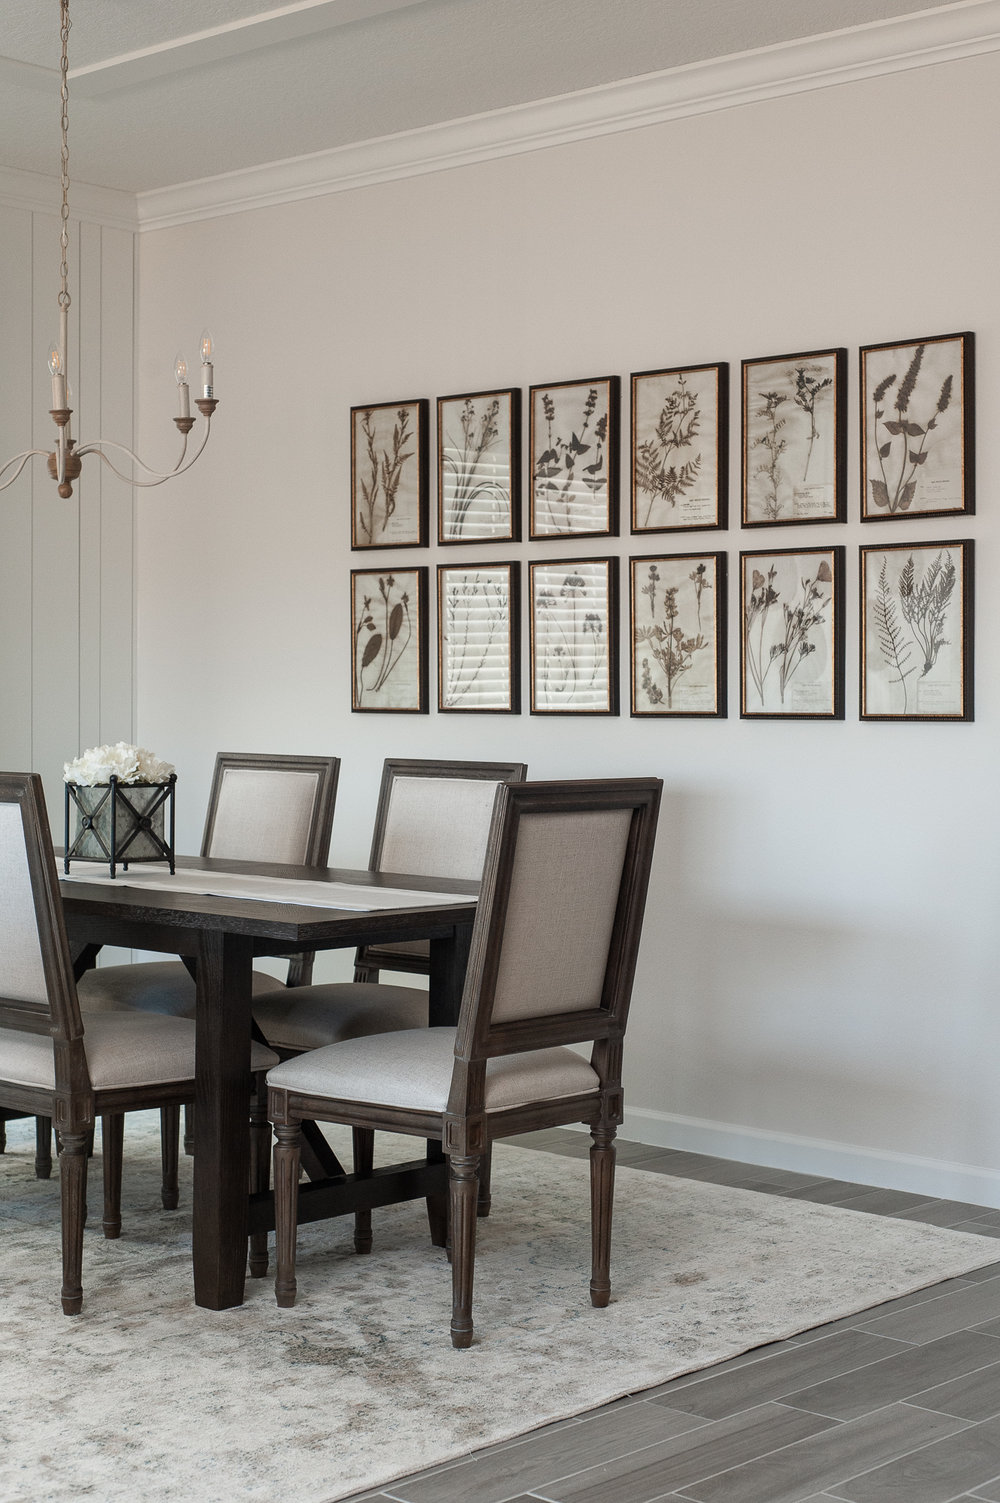 Micamy_Interior Designer_Design_Interior_Model_Merchandising_Dining_Room_Formal_Universal_Furniture_Rug_Loloi_Uttermost_Creative Co-Op.jpg